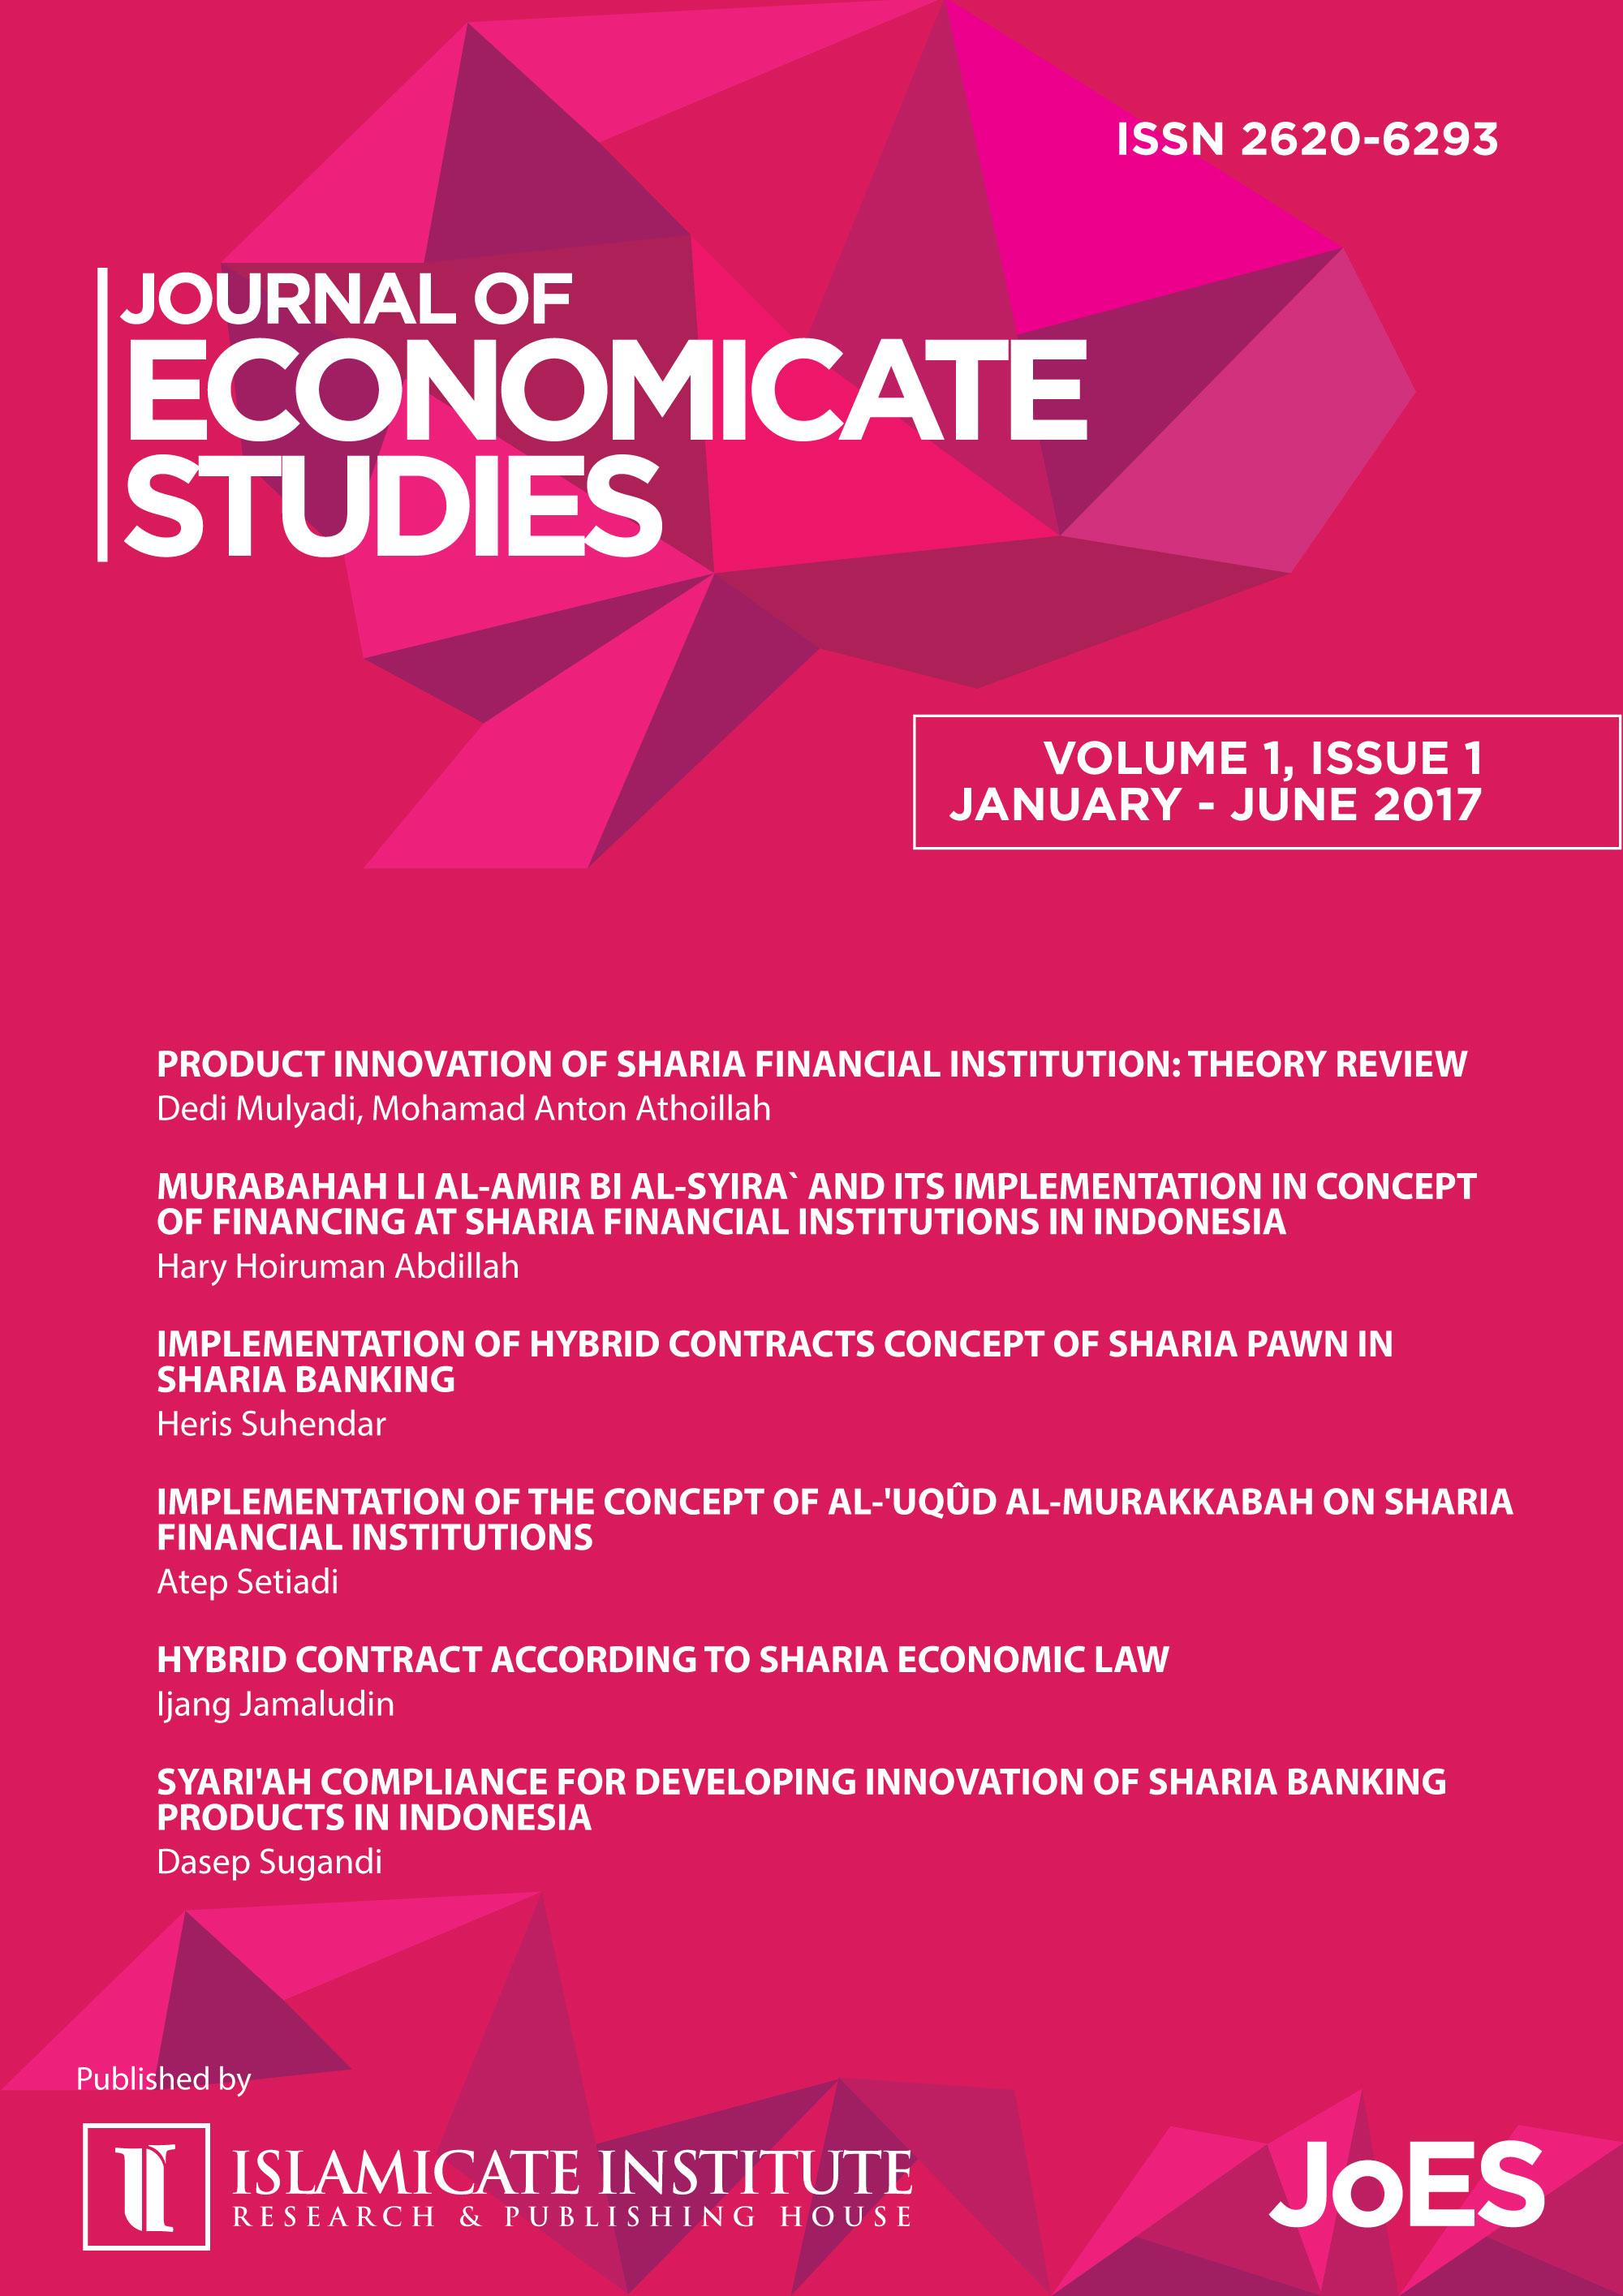 Journal of Economicate Studies [JoES]